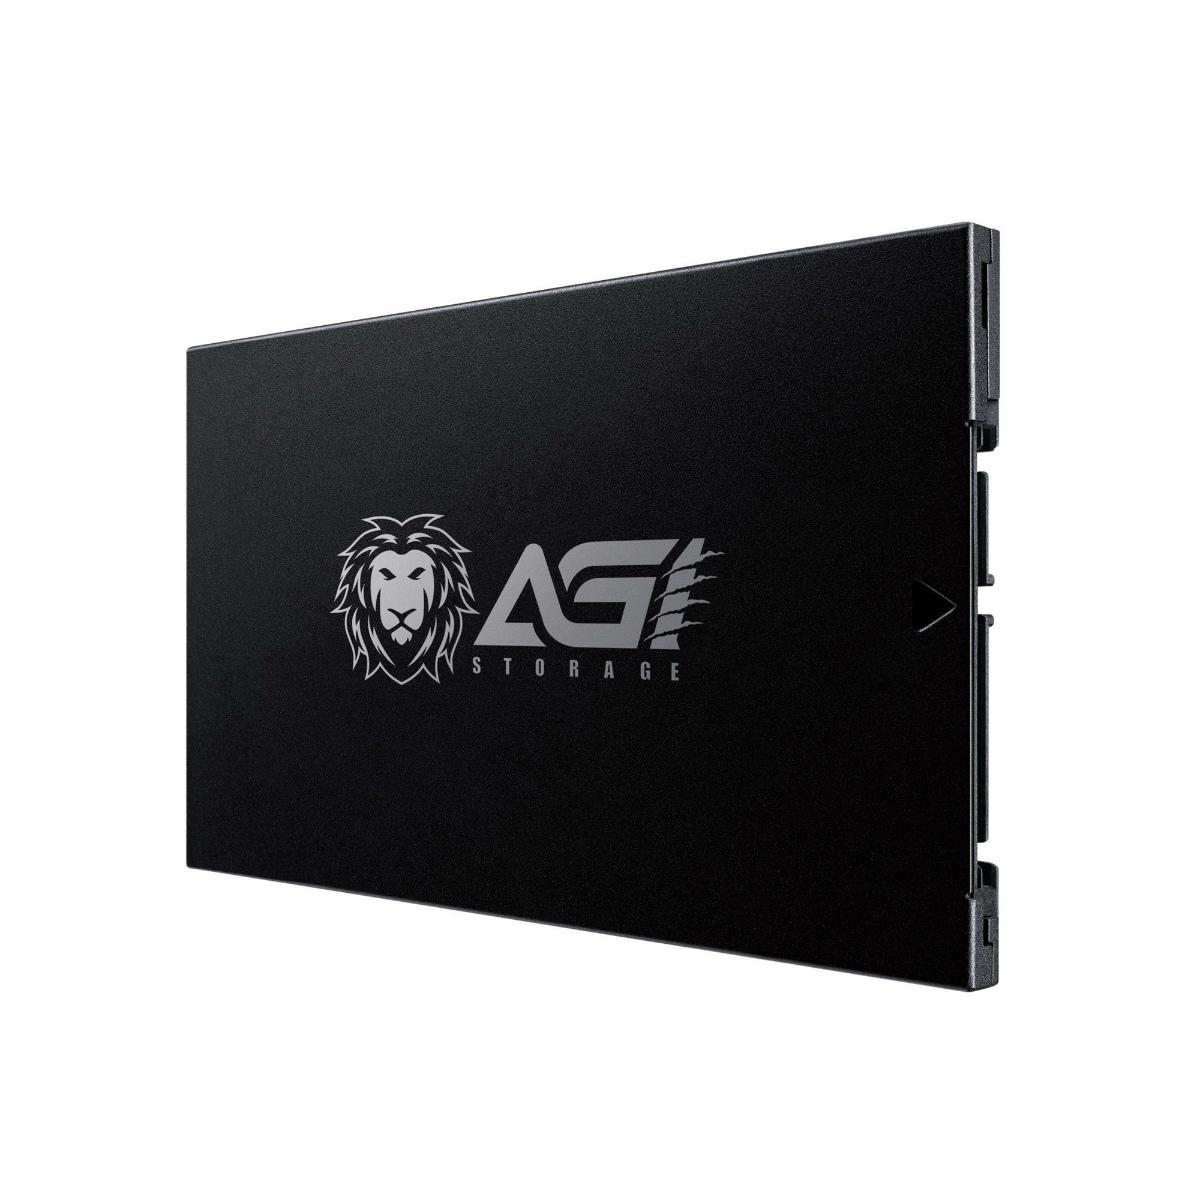 "SSD 2.5"" S-ATA 960GB AGI AGI960G17AI178 2.5inch SSD 6Gb/s INTEL 3D NAND  R=560MB/s W=525MB/s 7mm SM2258XT JANコード:4718009610040"